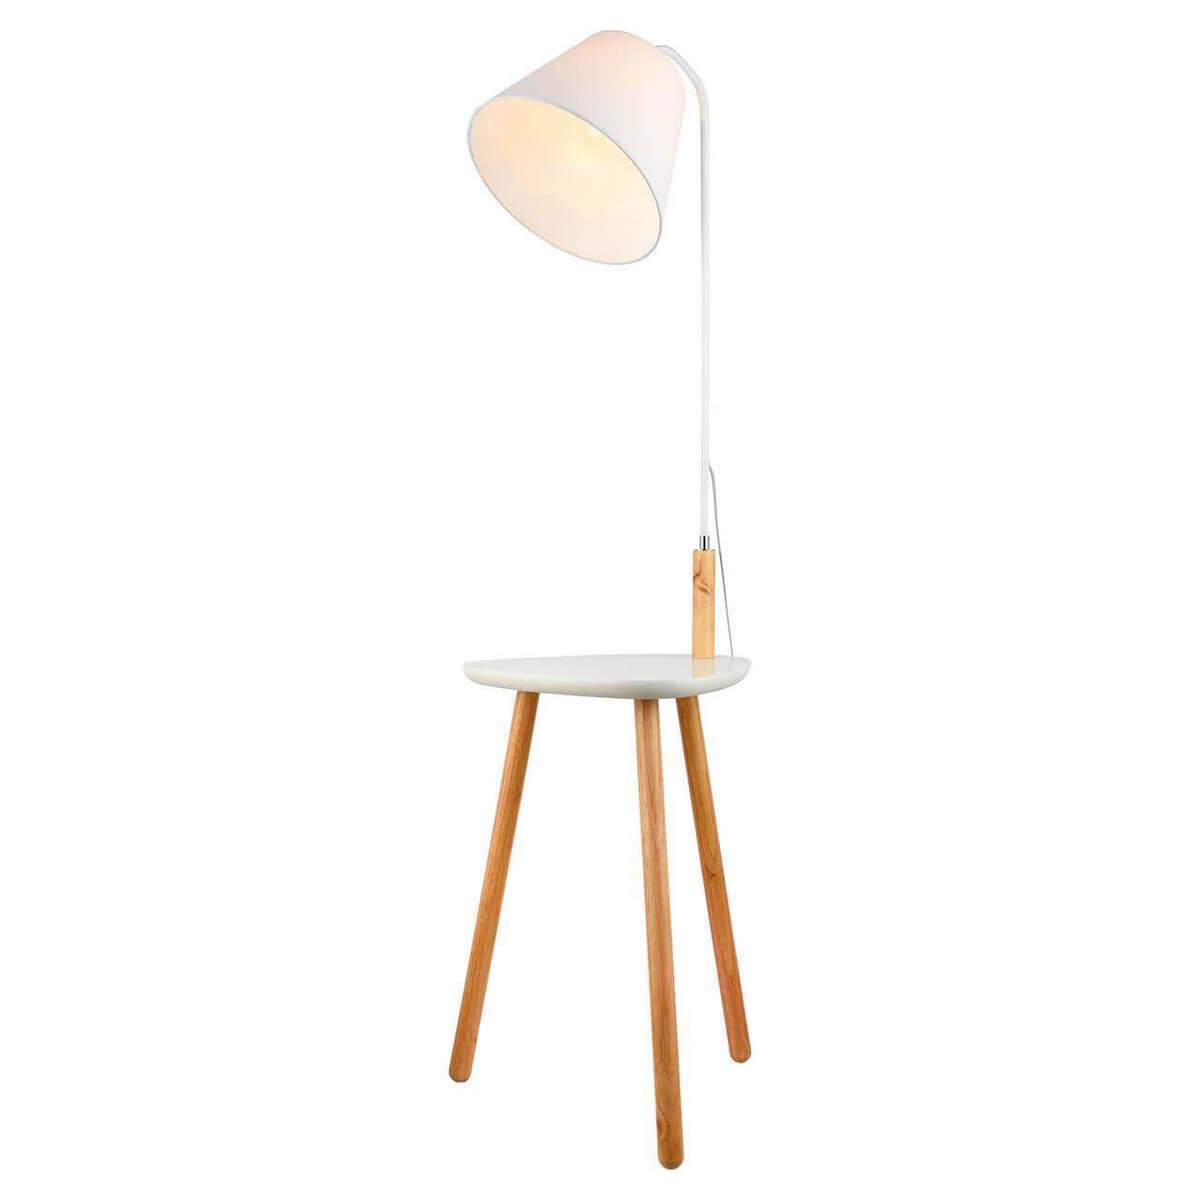 Напольный светильник Lussole LSP-0522, E27, 40 Вт vodosgon silicone avs sb 0522 a78301s